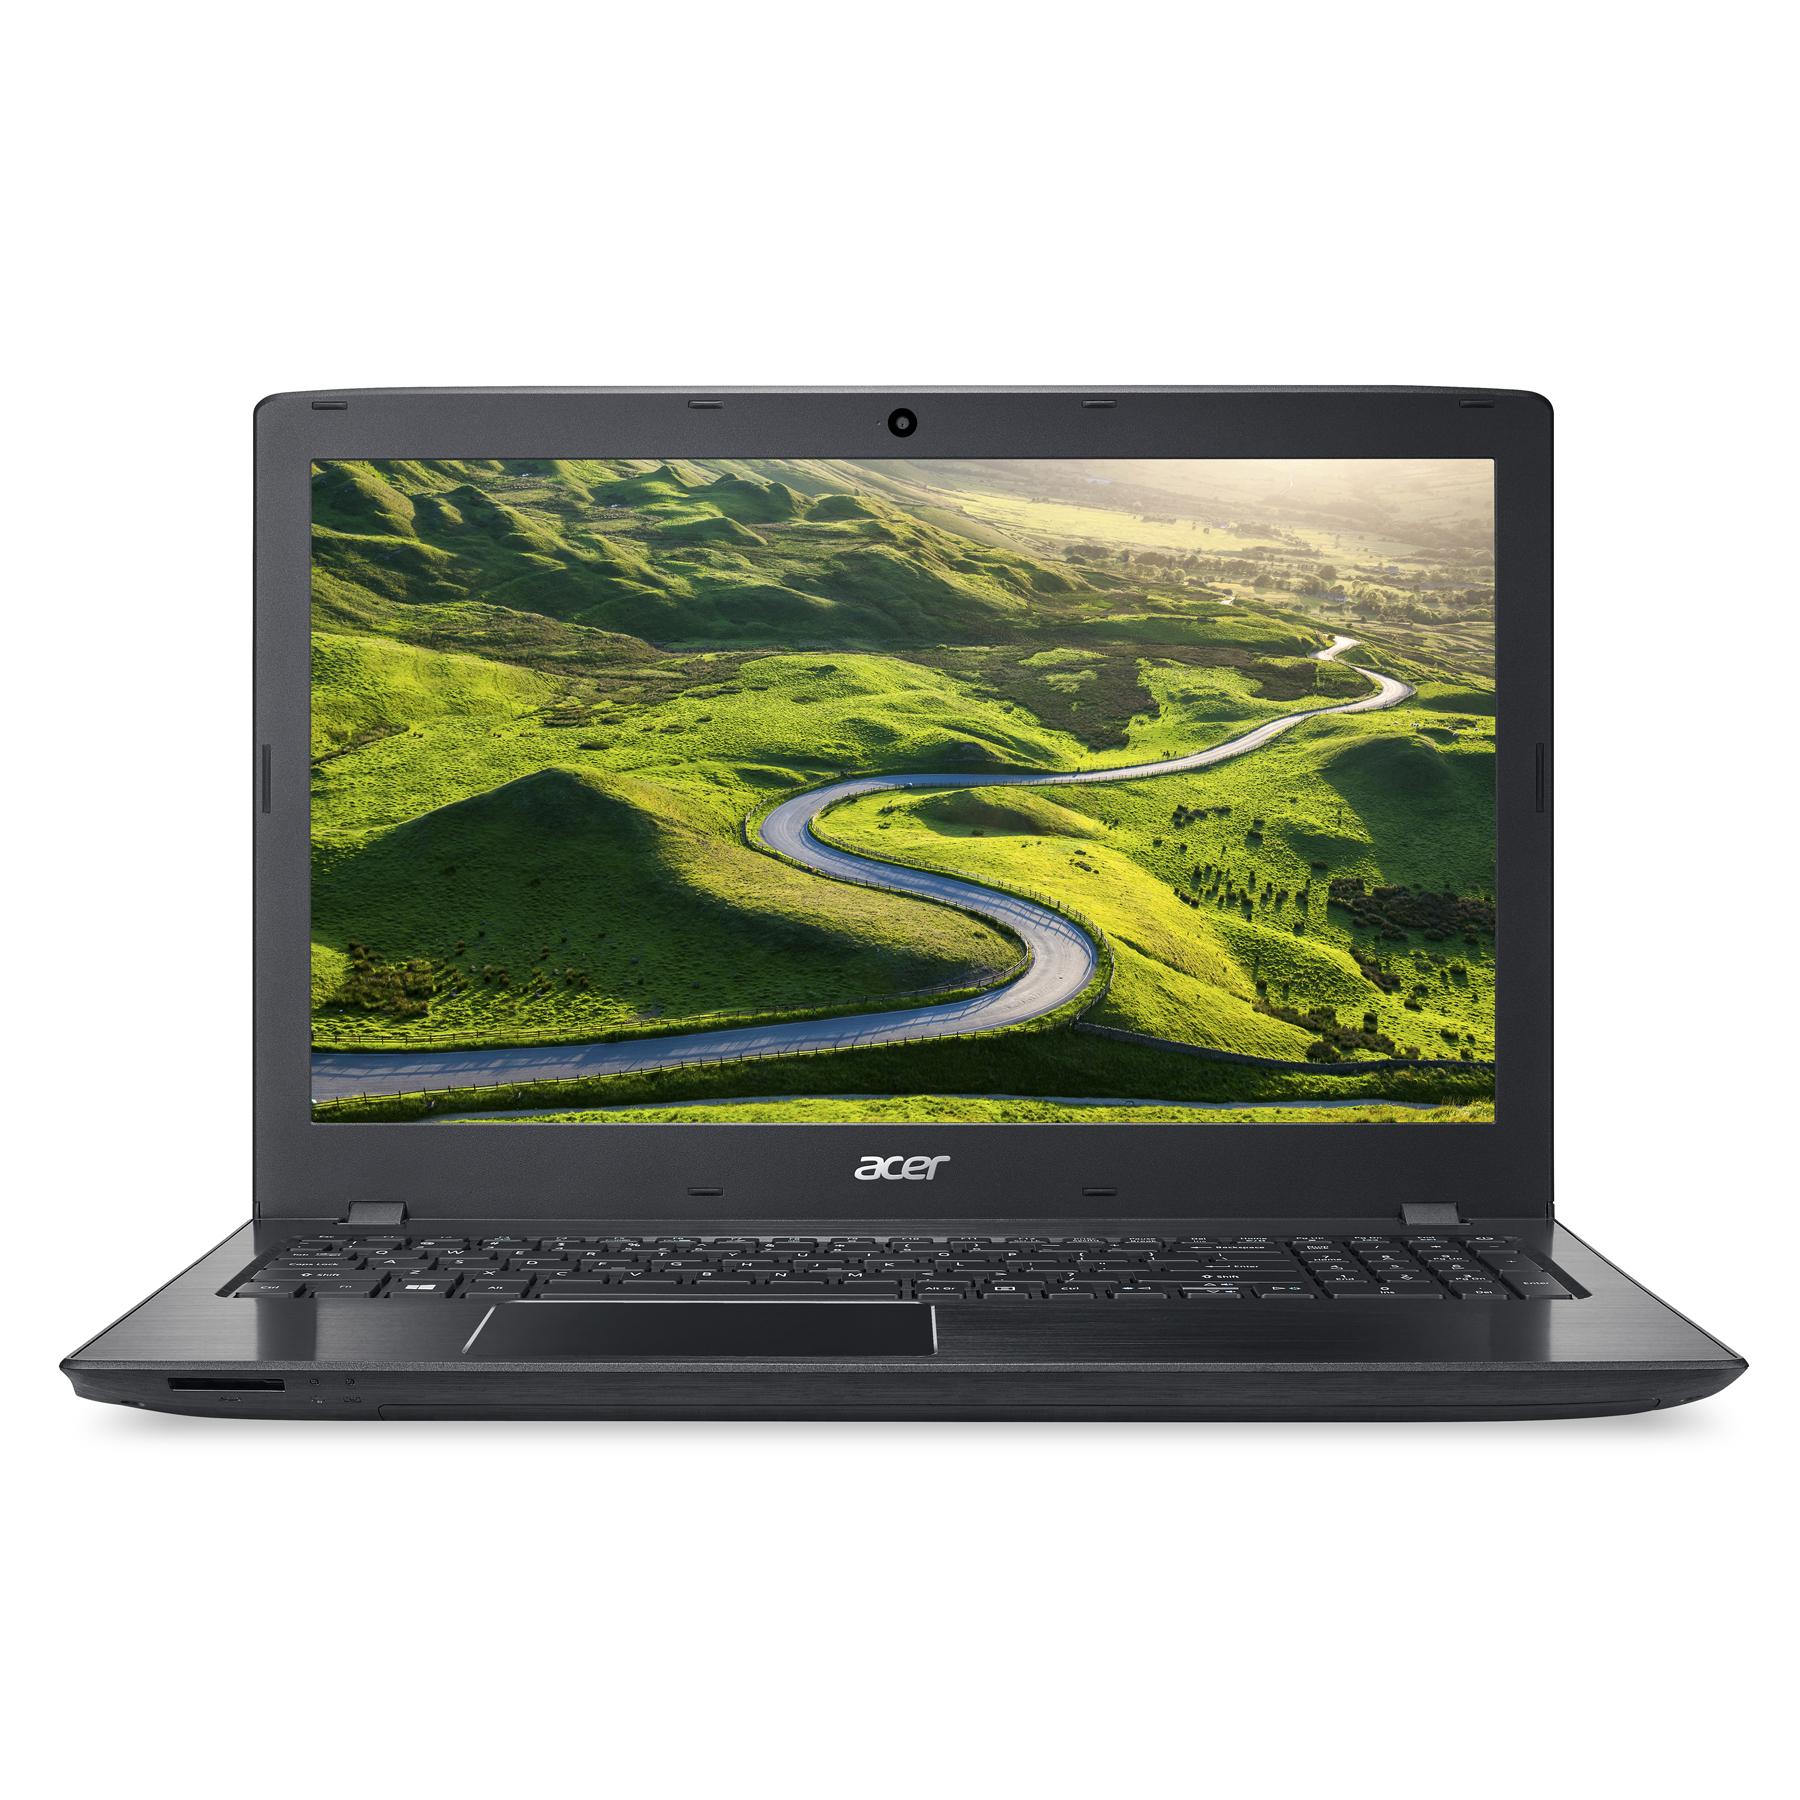 "Acer Aspire E15. 15,6"" FHD matt, Intel® Core™ i5-7200U, GTX 950M, 8 GB DDR4, 1TB HDD, Wlan ac + Gbit Lan, DVD Brenner für 542,64€ (NBB)"